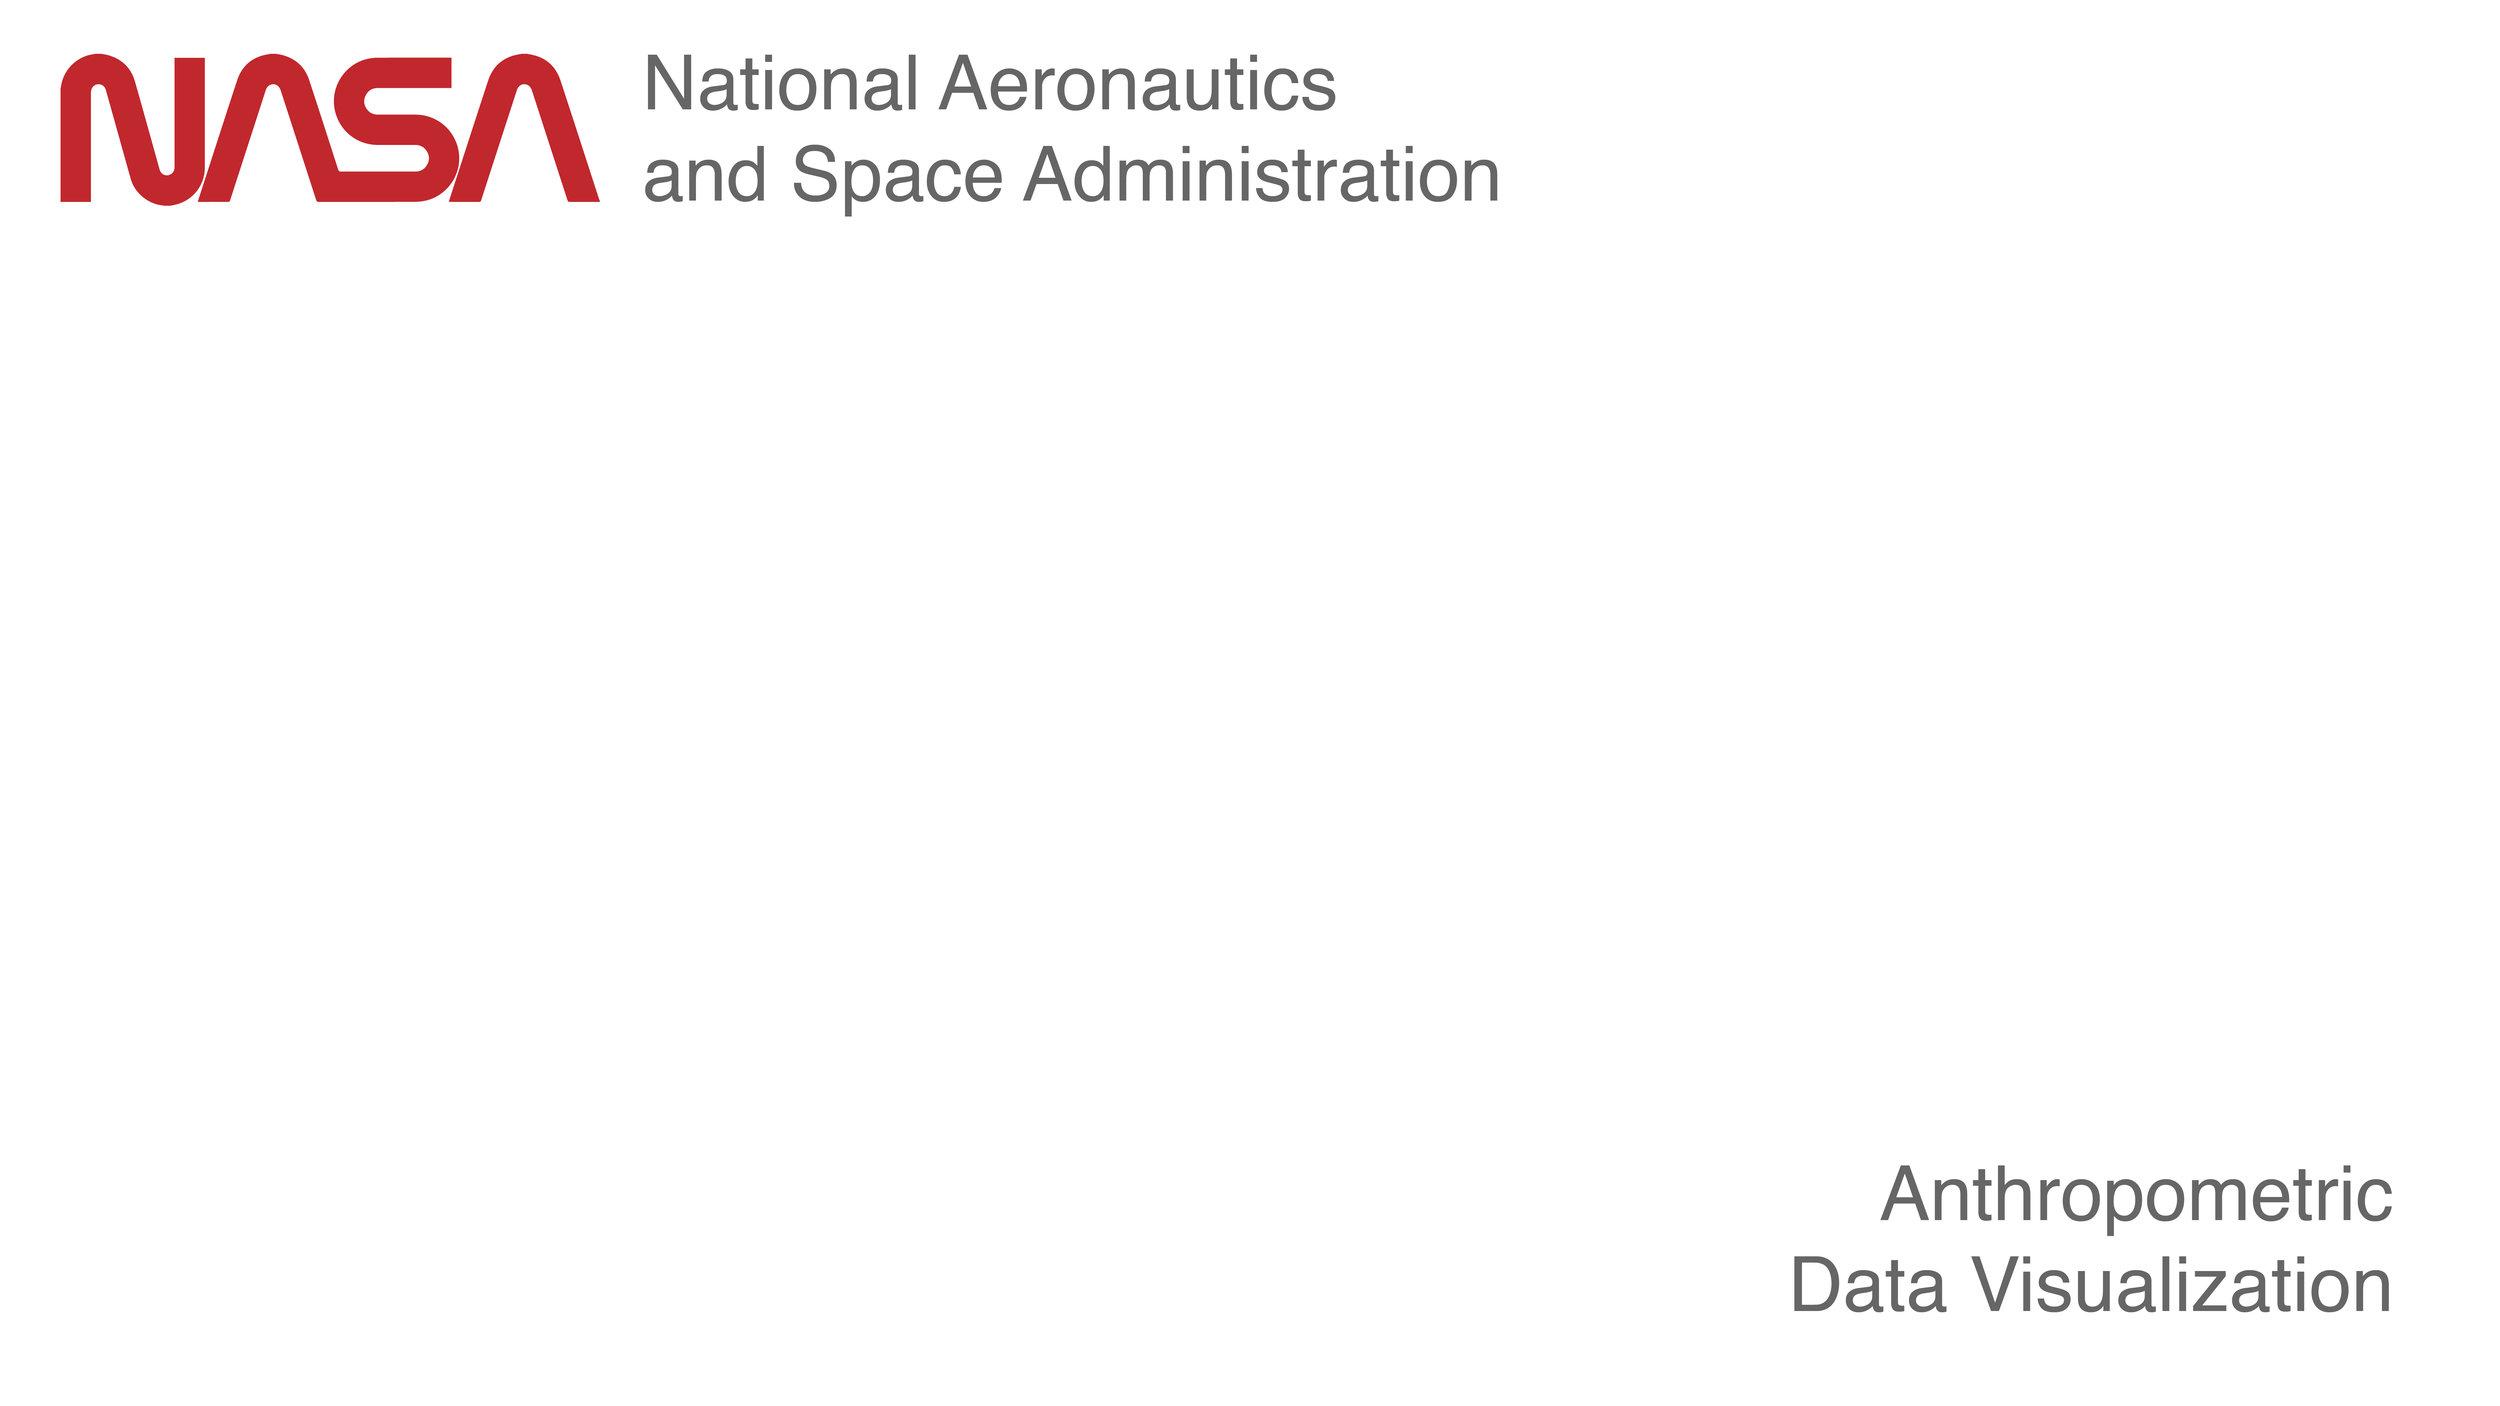 Anthropometric Data Visualization [Recovered]-01.jpg